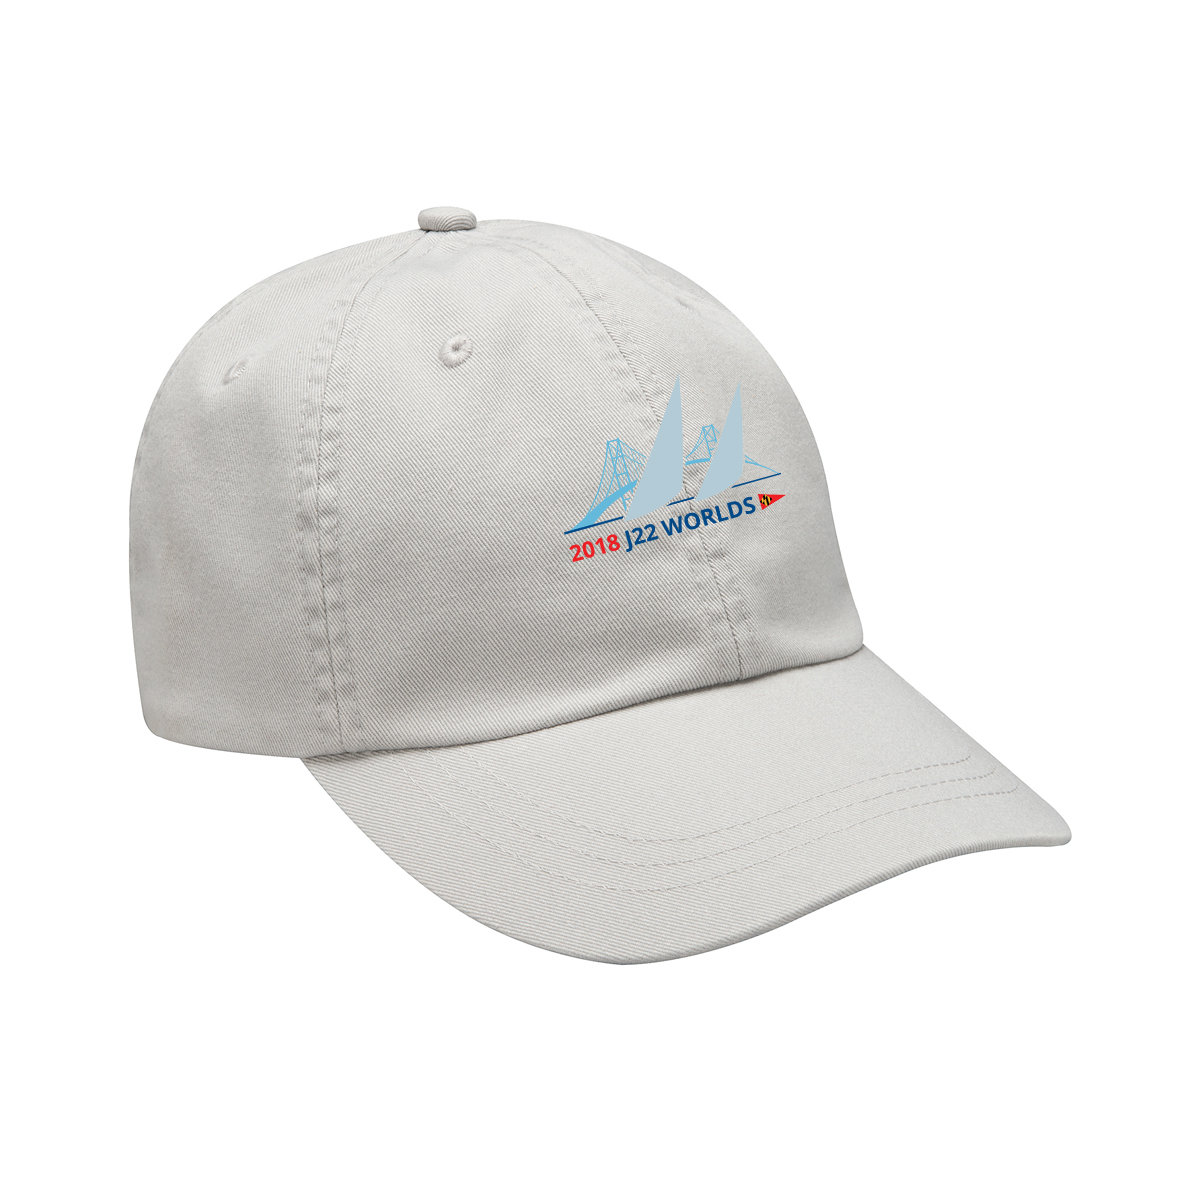 J22 WORLDS - COTTON CAP